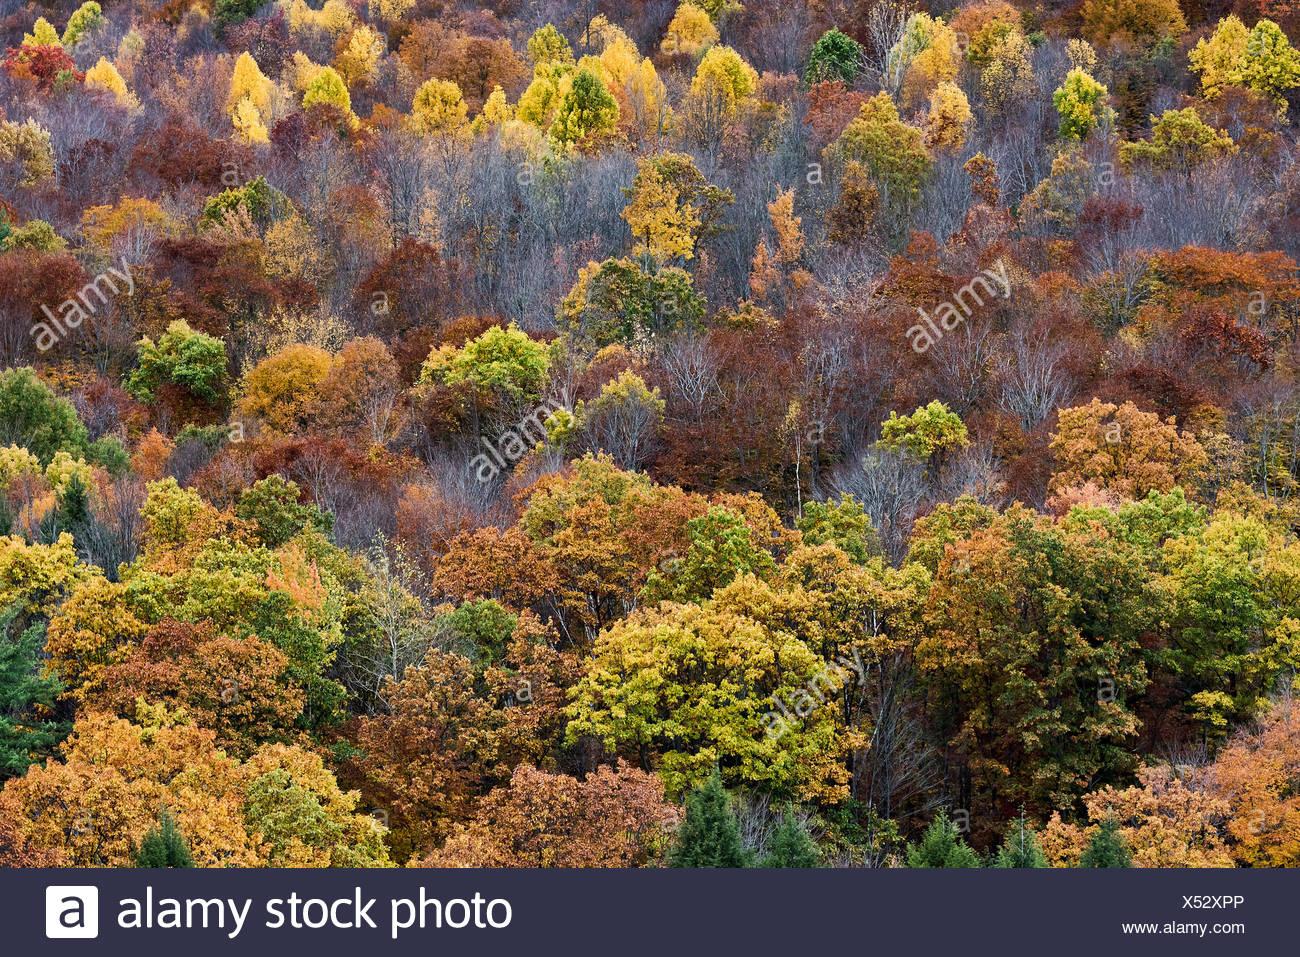 Colorful stand of autumn trees, Pennsylvania, USA - Stock Image